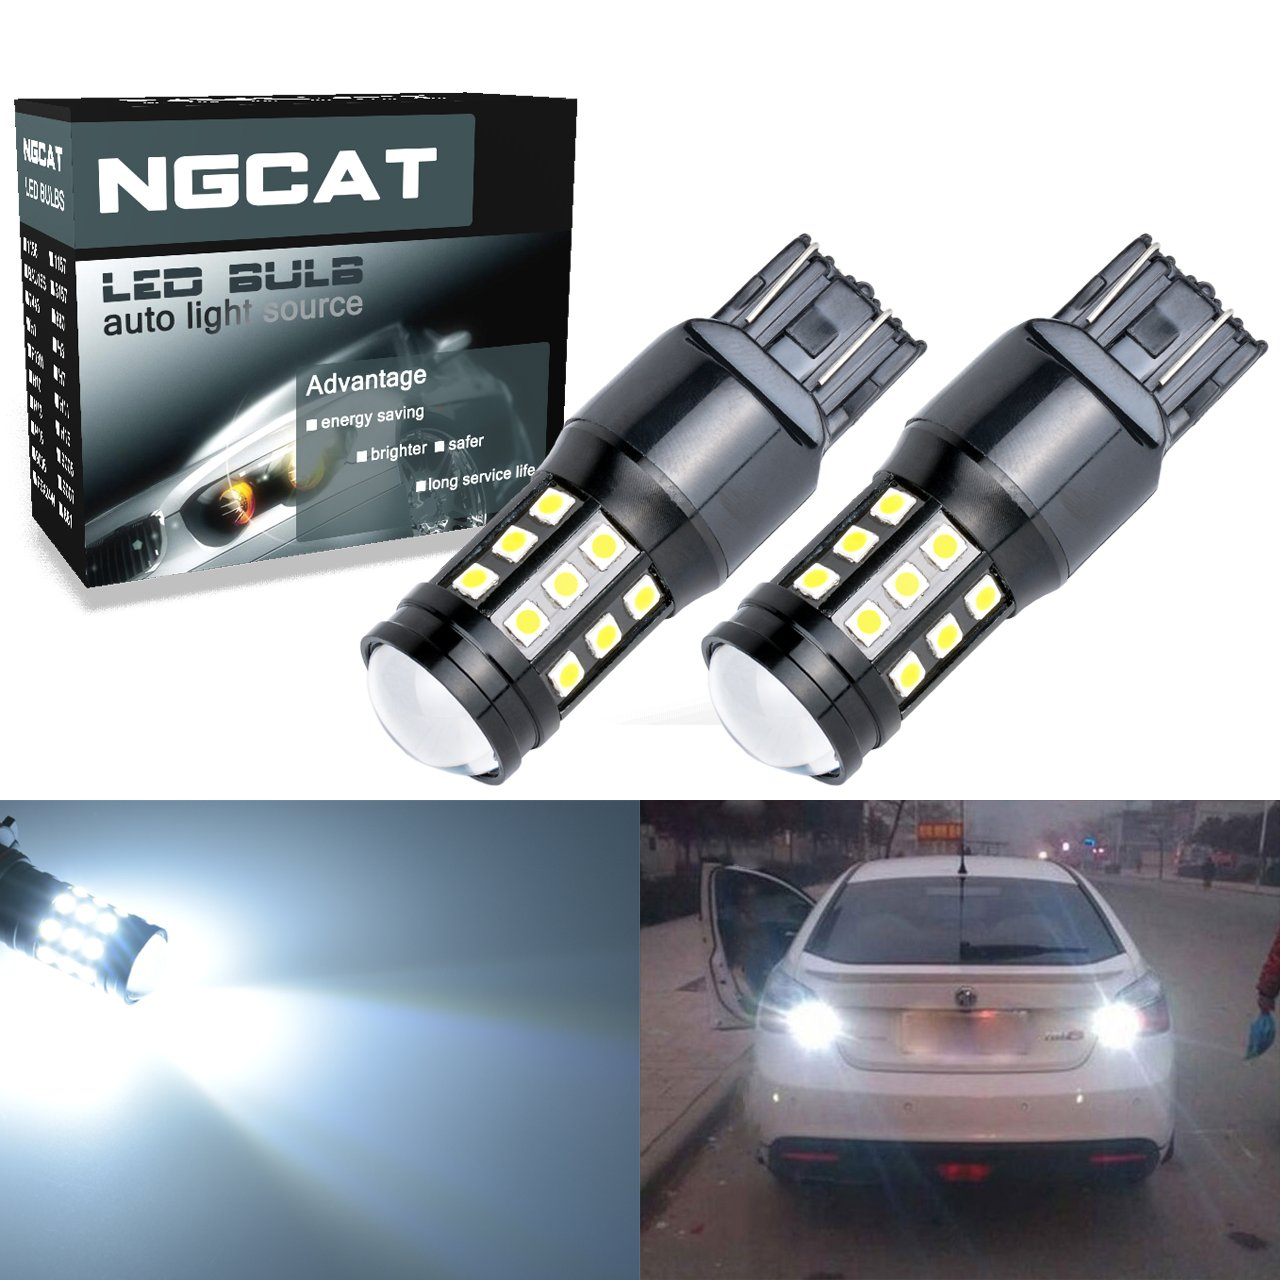 NGCAT Super Bright 2PCS 2700 Lumens 3030 27SMD 7443 7444NA 7440 7440NA 7441 992 Lens LED Brake Light Turn Signals Bulbs Reverse Tail Lights 12V-24V 6000K (White)